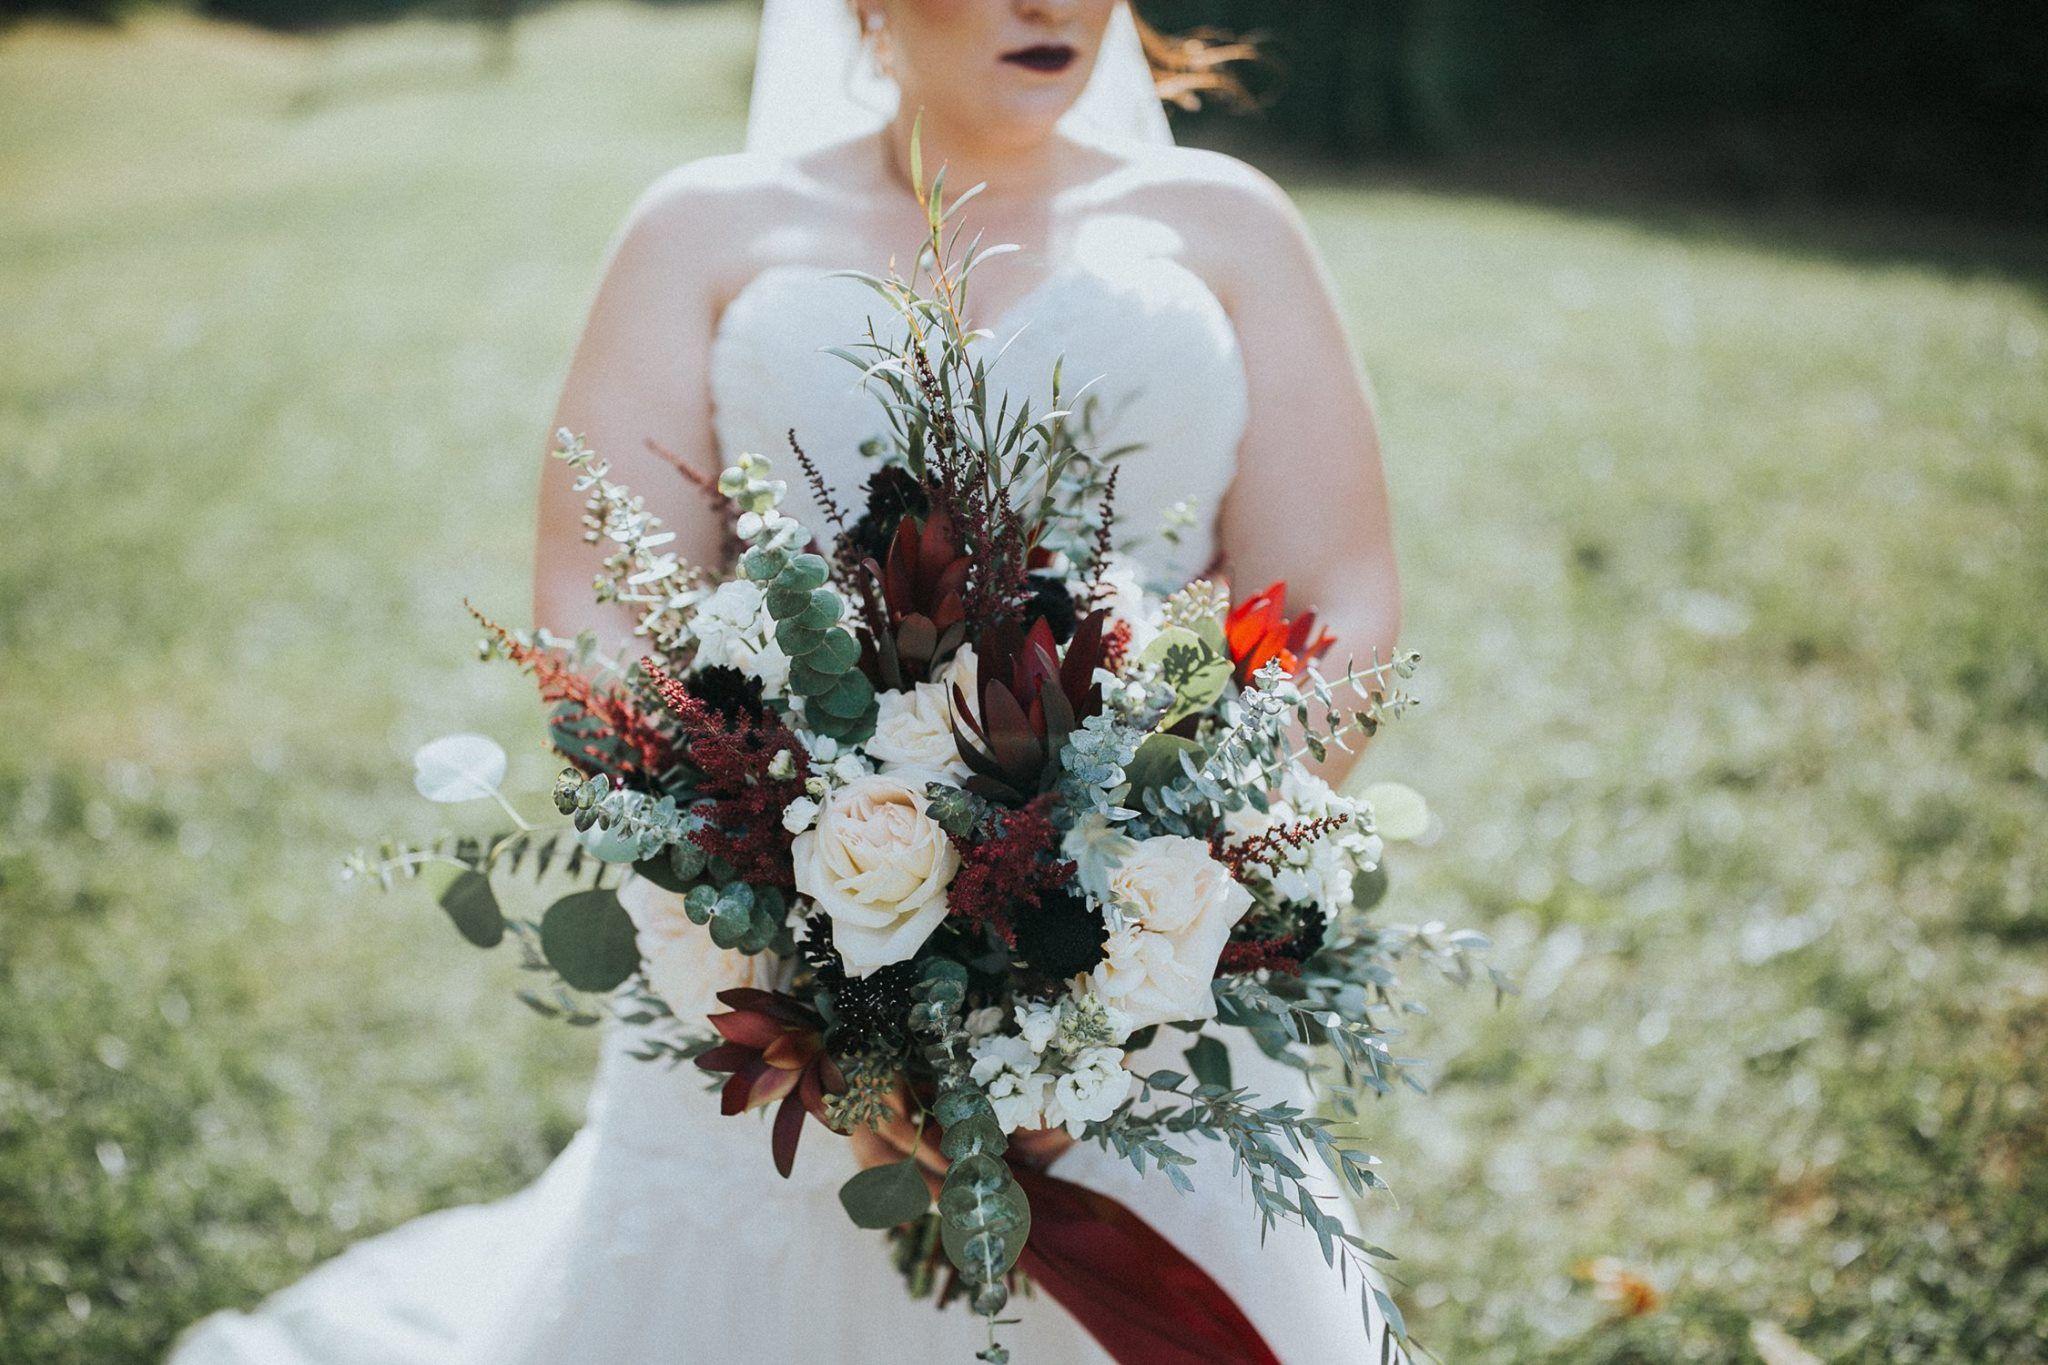 Outdoor wedding, rustic wedding; barn wedding; wildflower